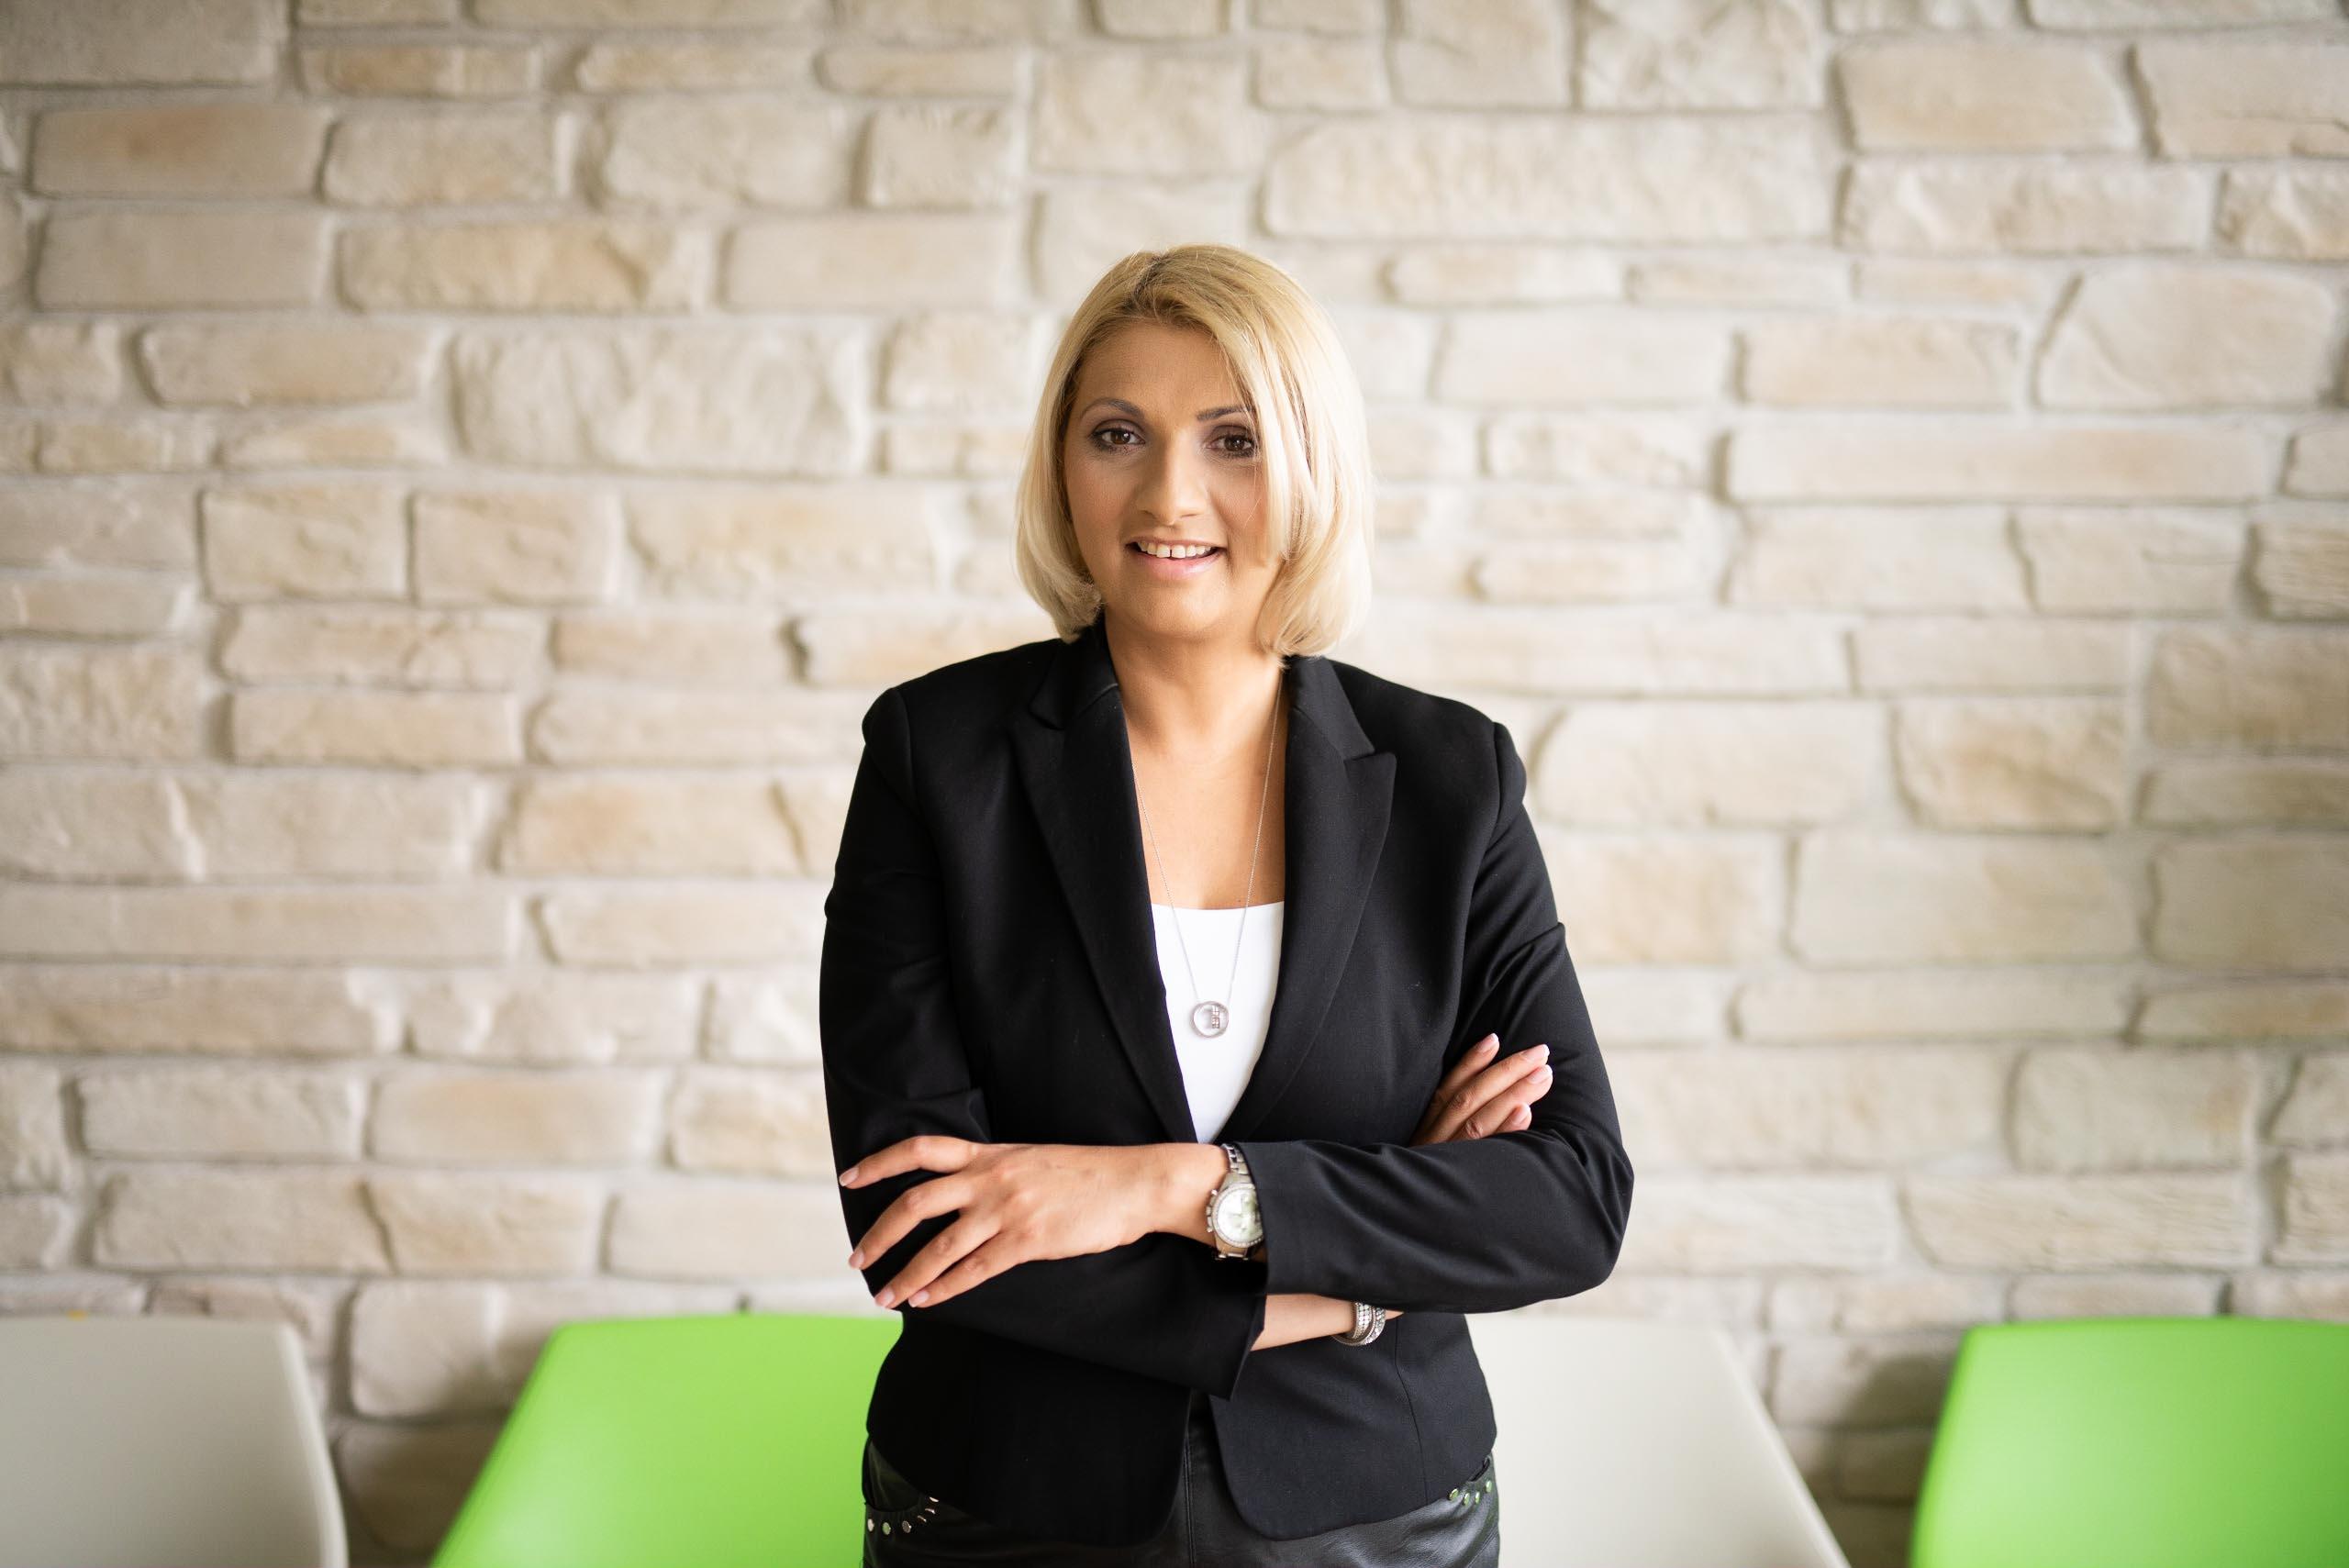 Melita Manojlović, life and business coach